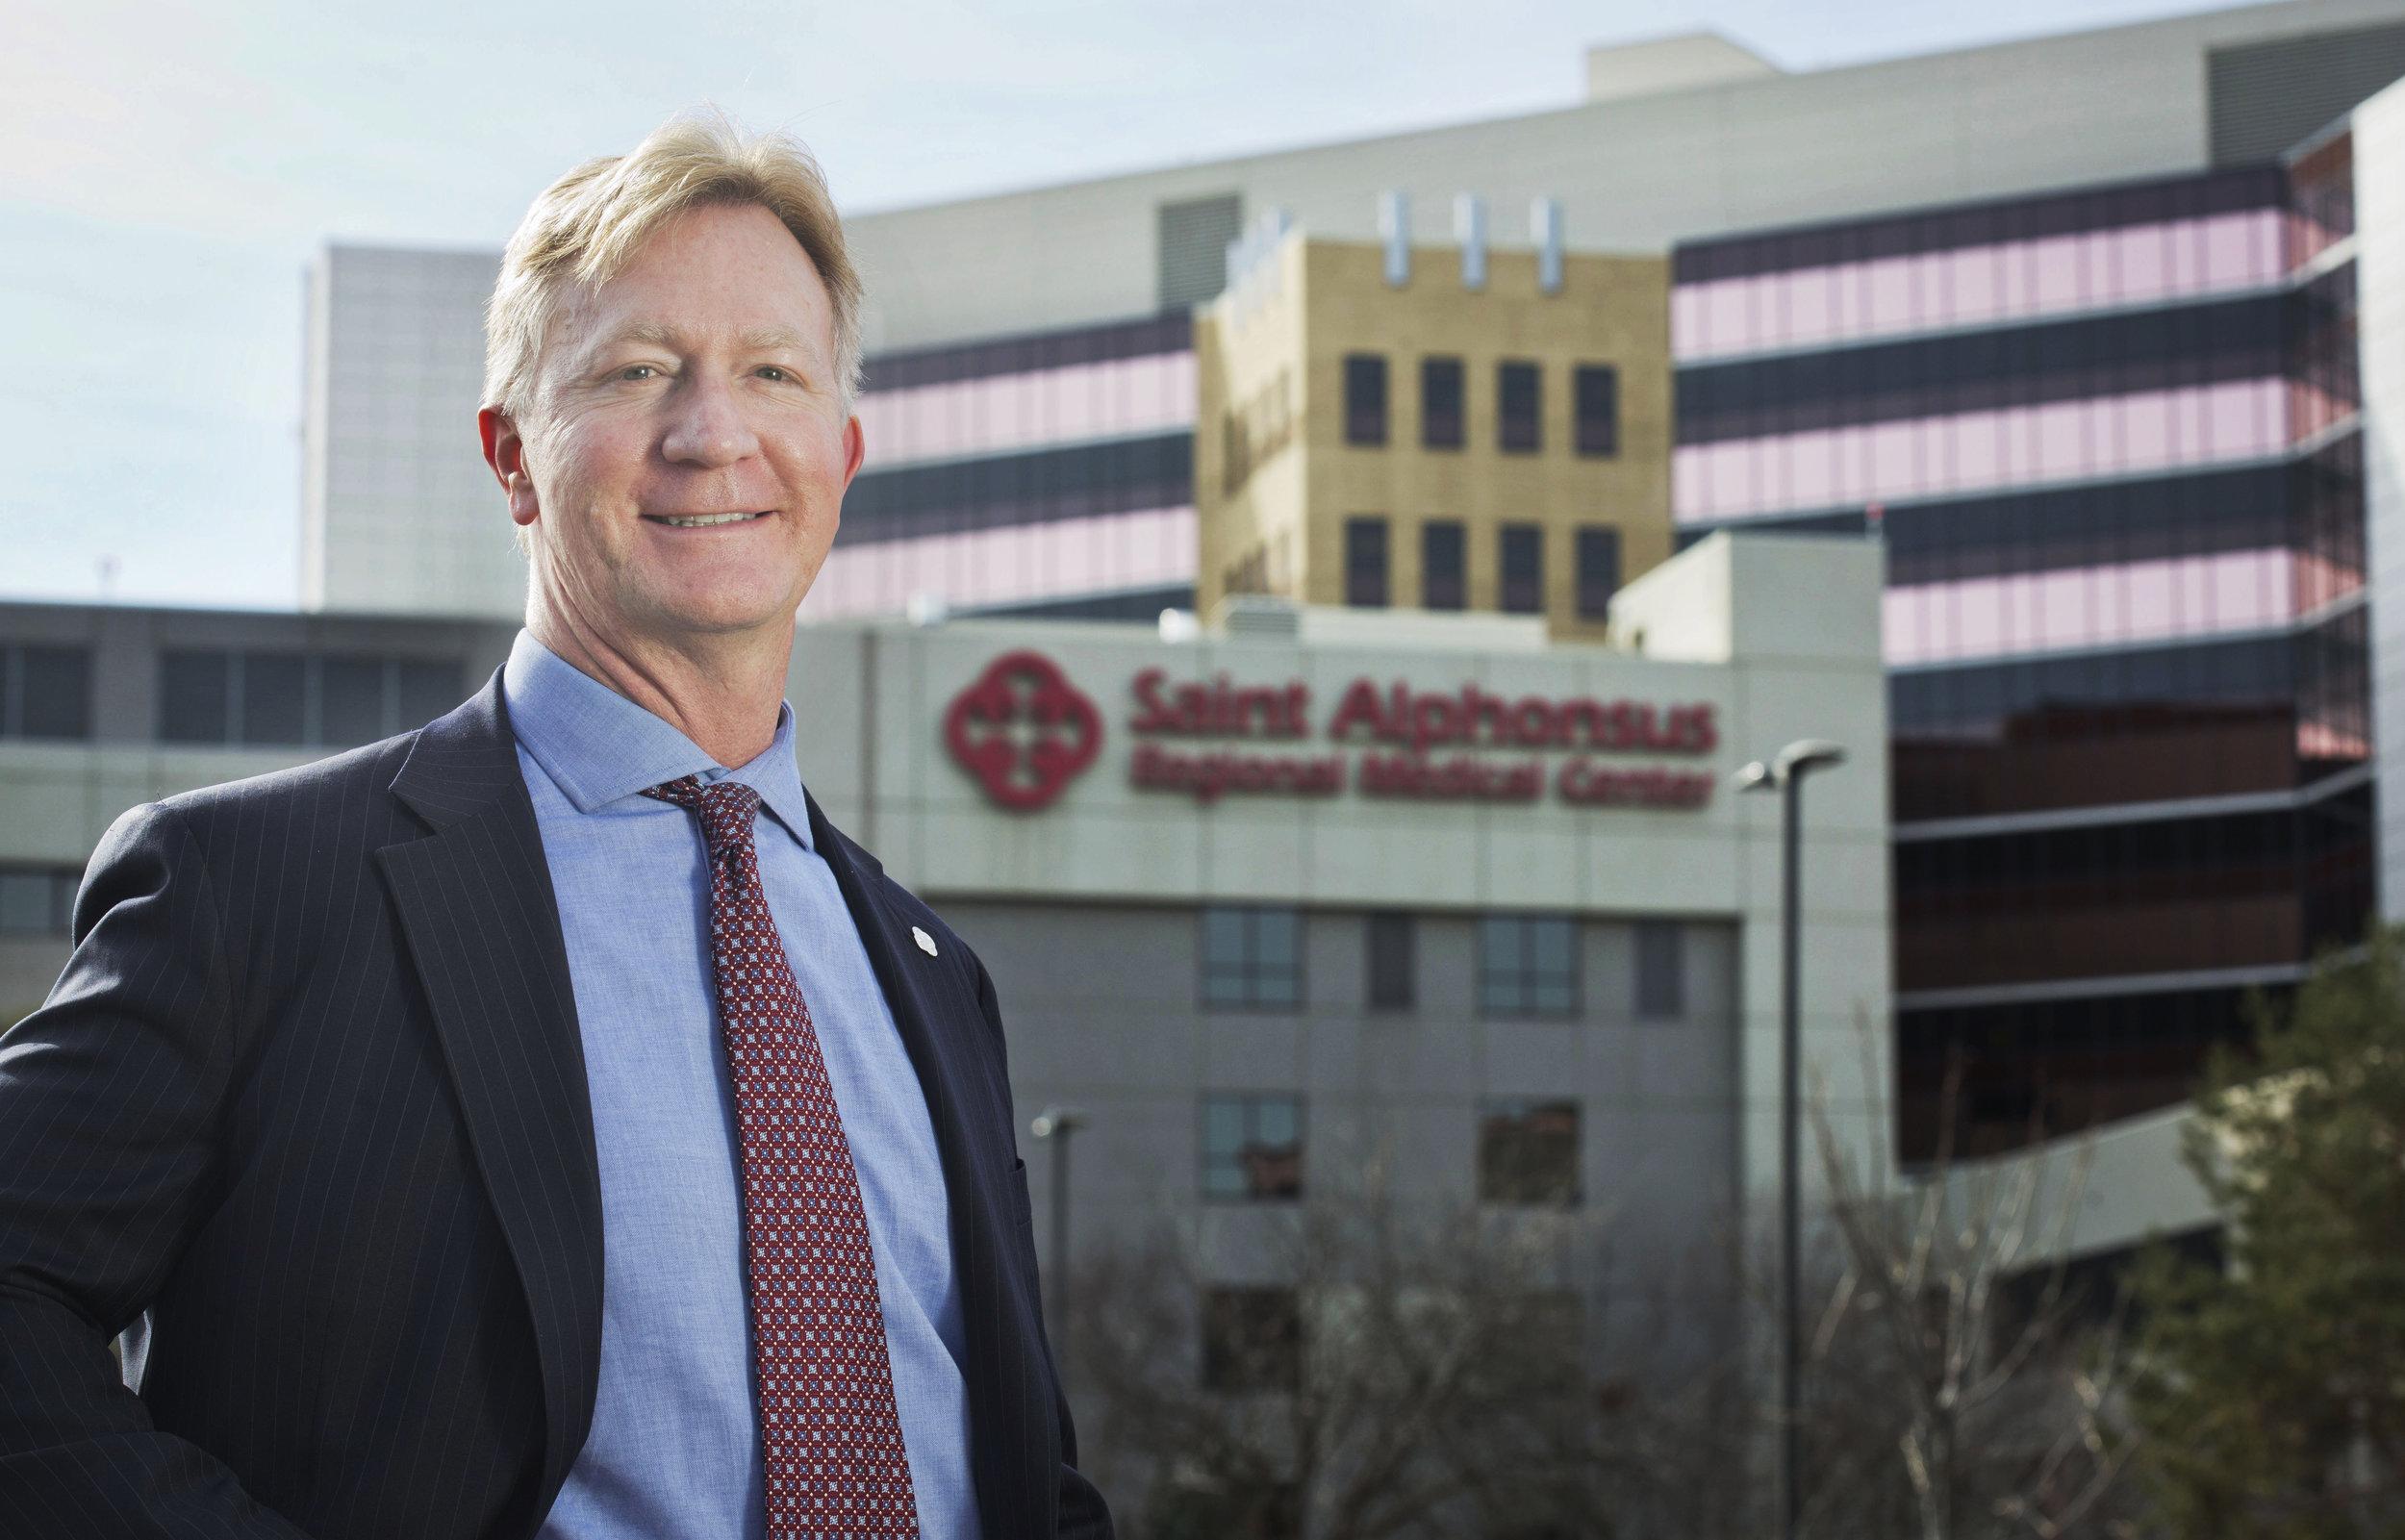 Rodney Reider at the Saint Alphonsus Health System